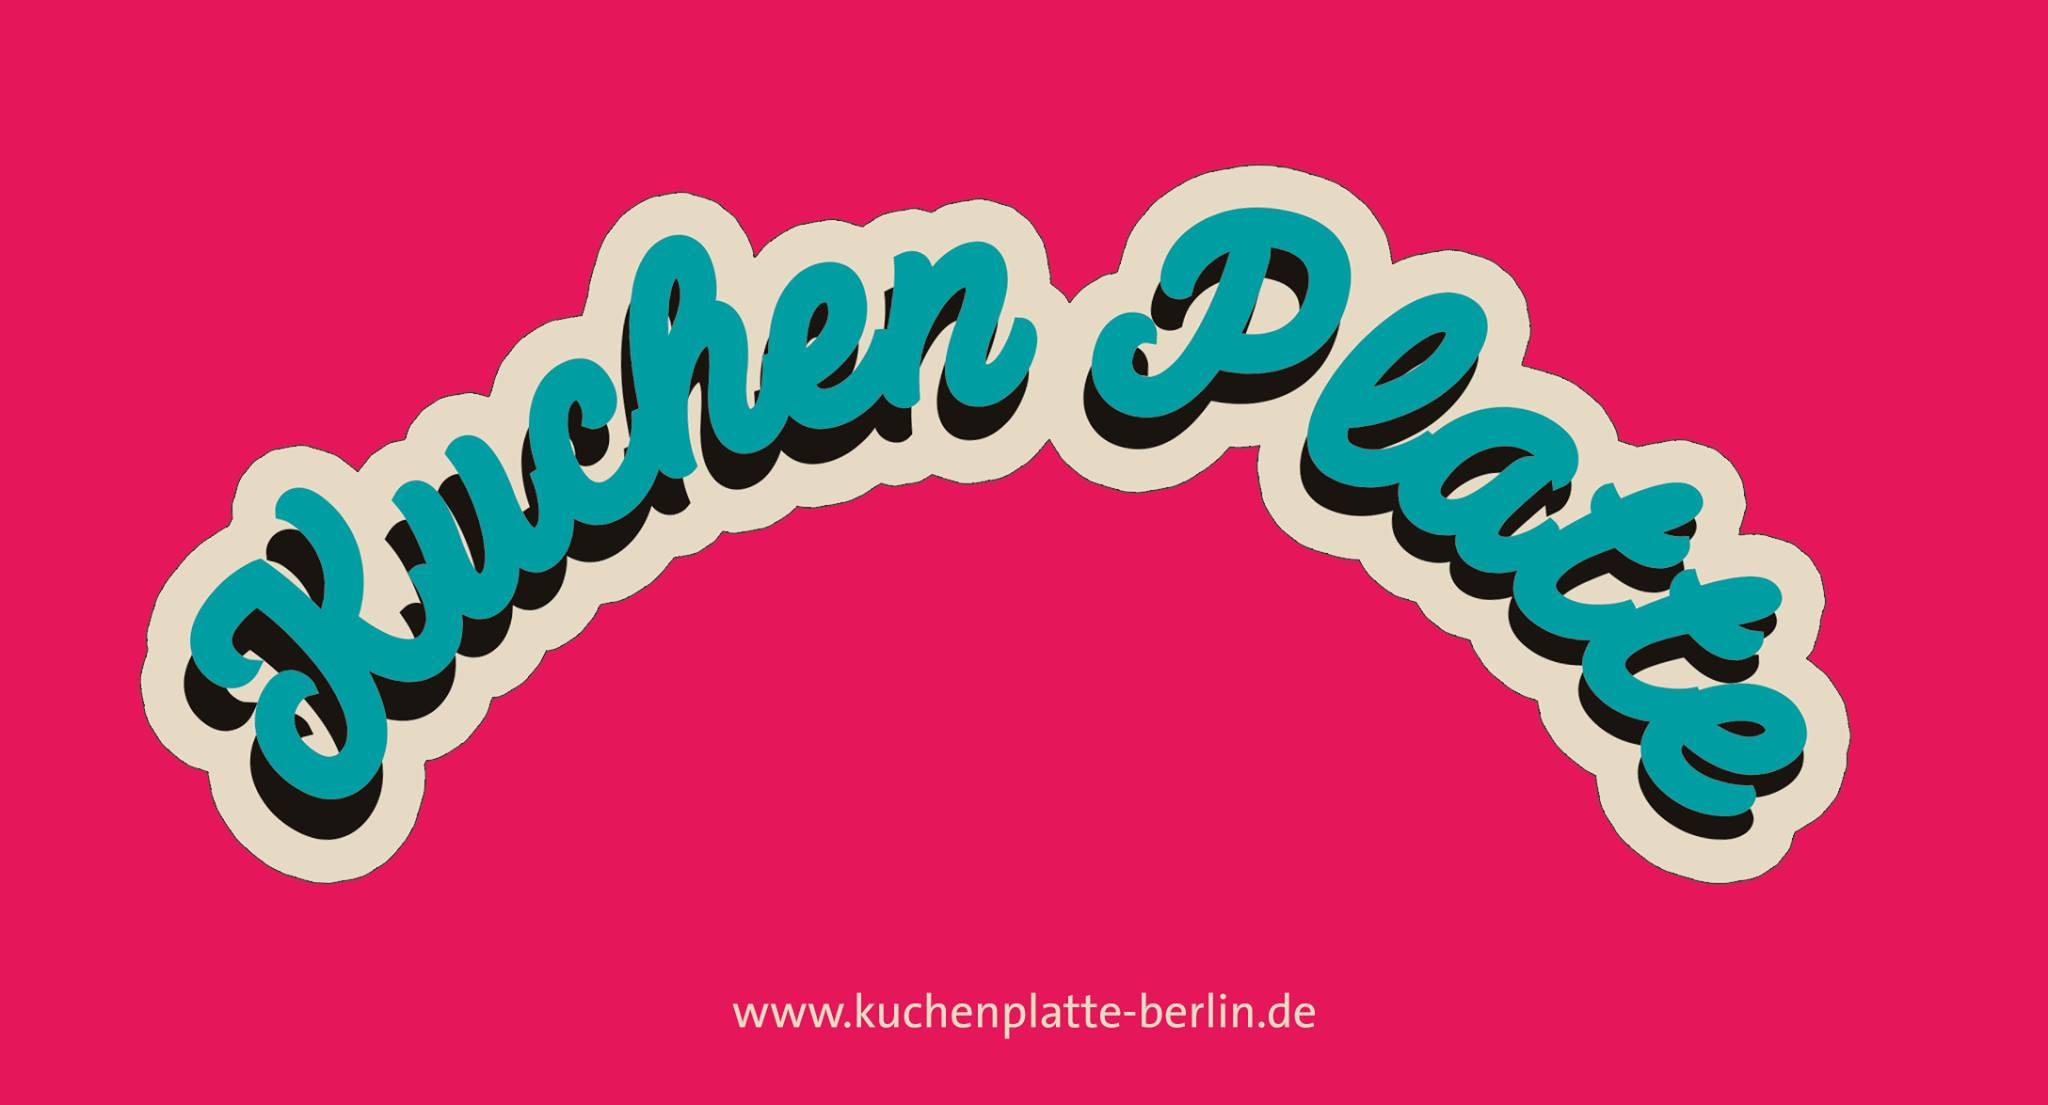 5 Years Kuchenplatte X Wedding Soul Panke Music Art Caf 233